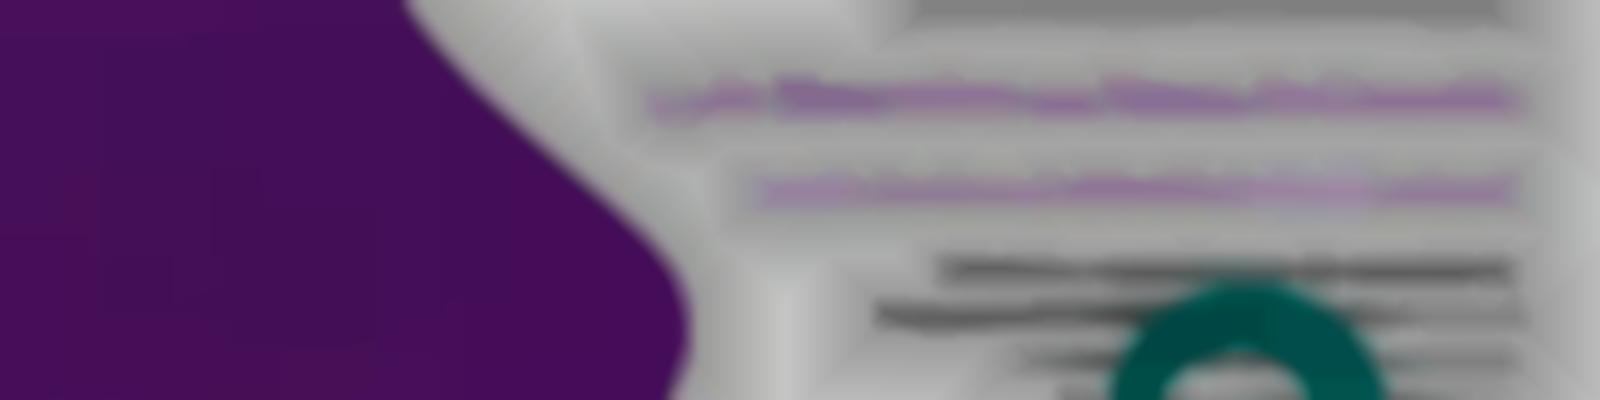 Bufando: Programación 25-N Burela